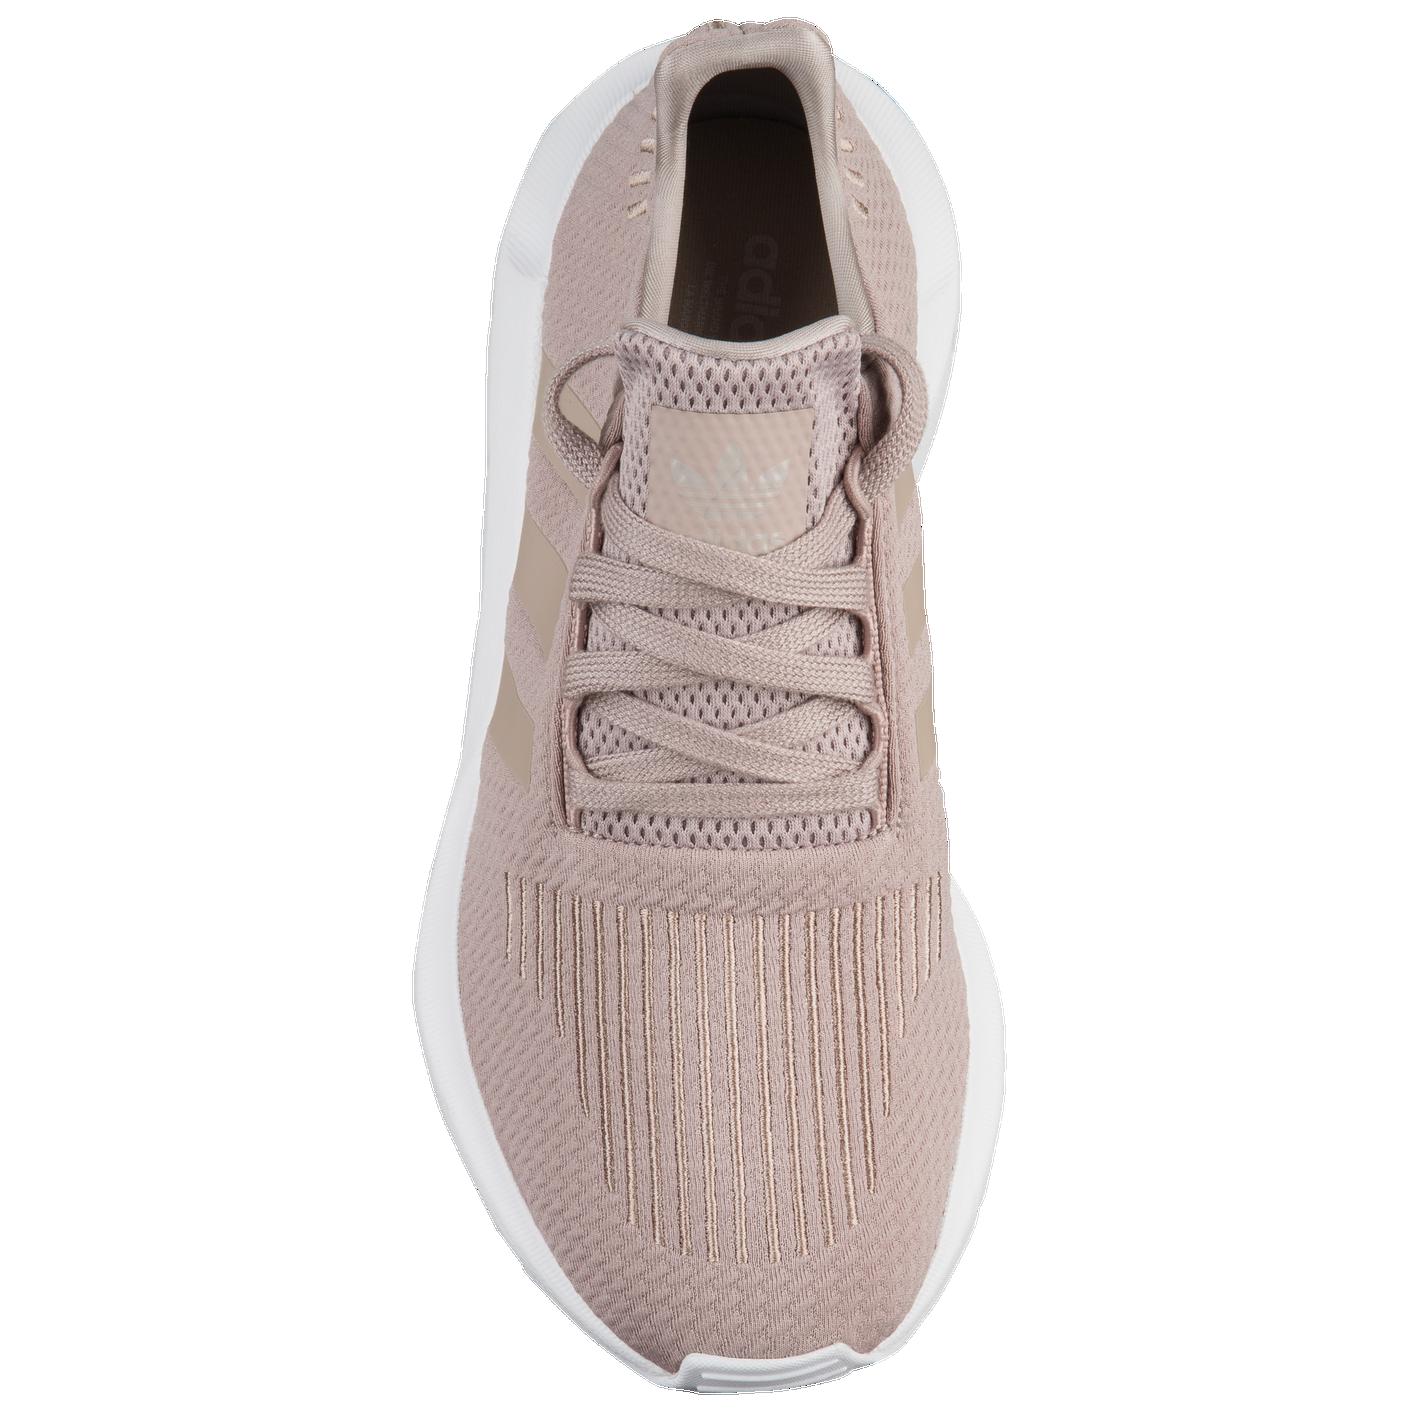 eb14af61b adidas Originals Swift Run - Women s - Casual - Shoes - Vapour Grey ...